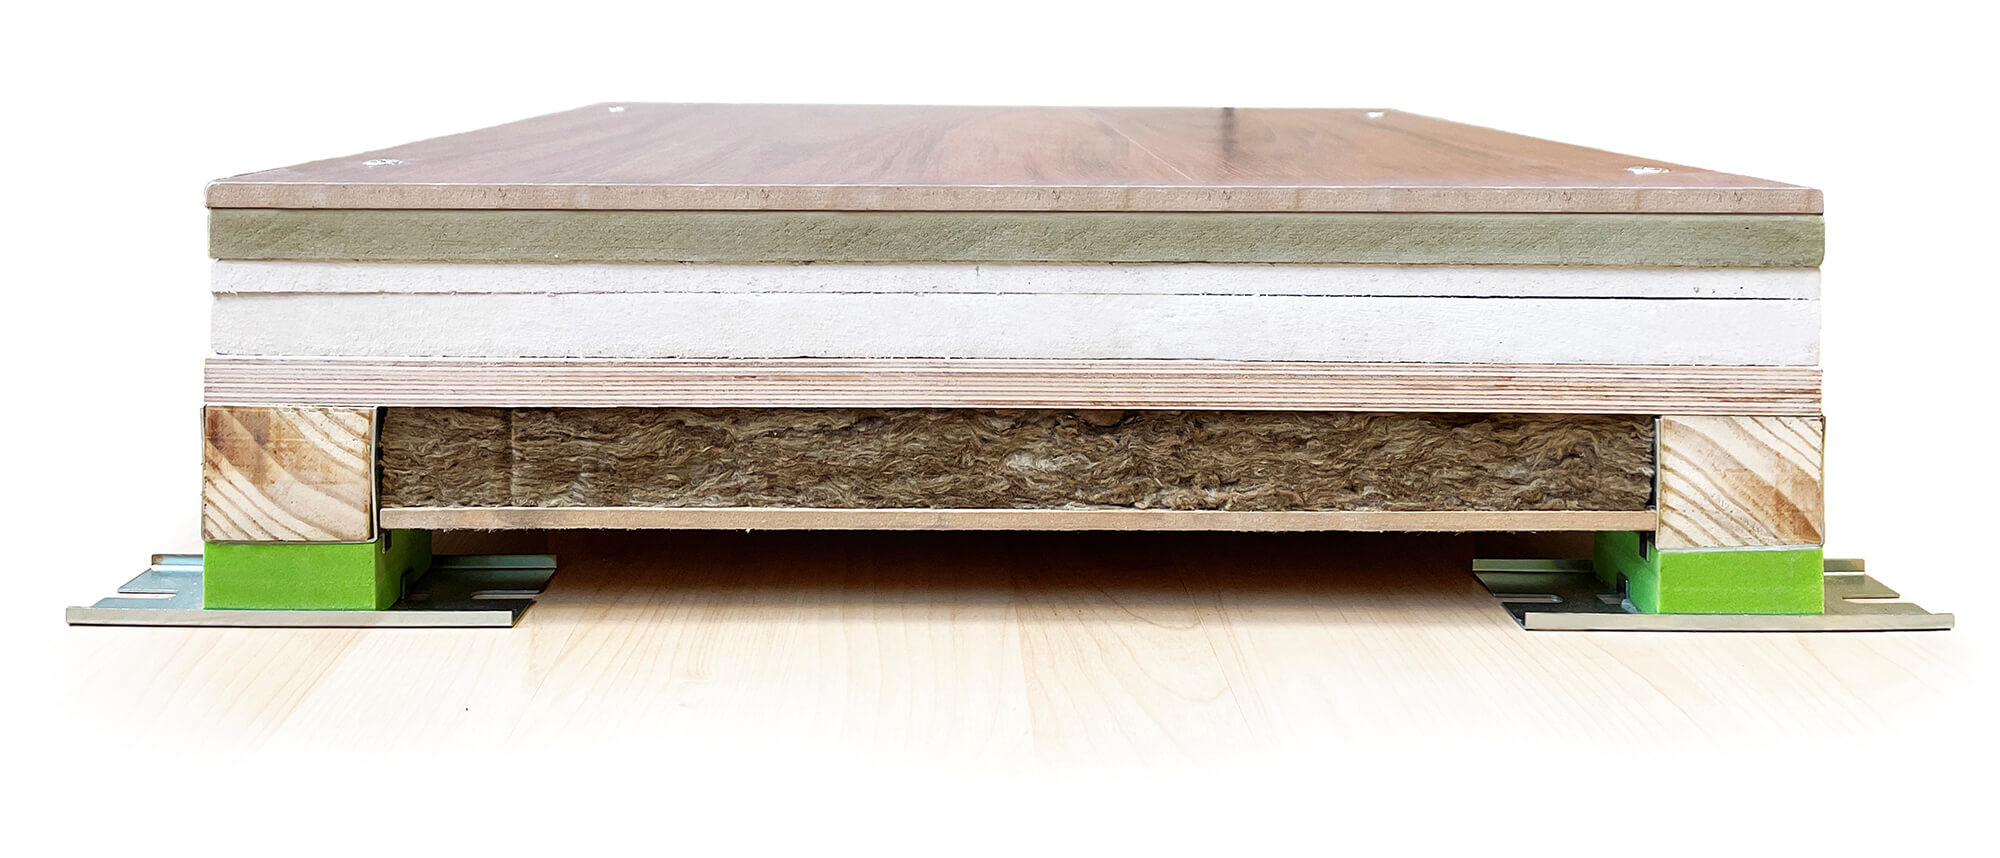 akustik-floor-mount-test-platform-0.jpg